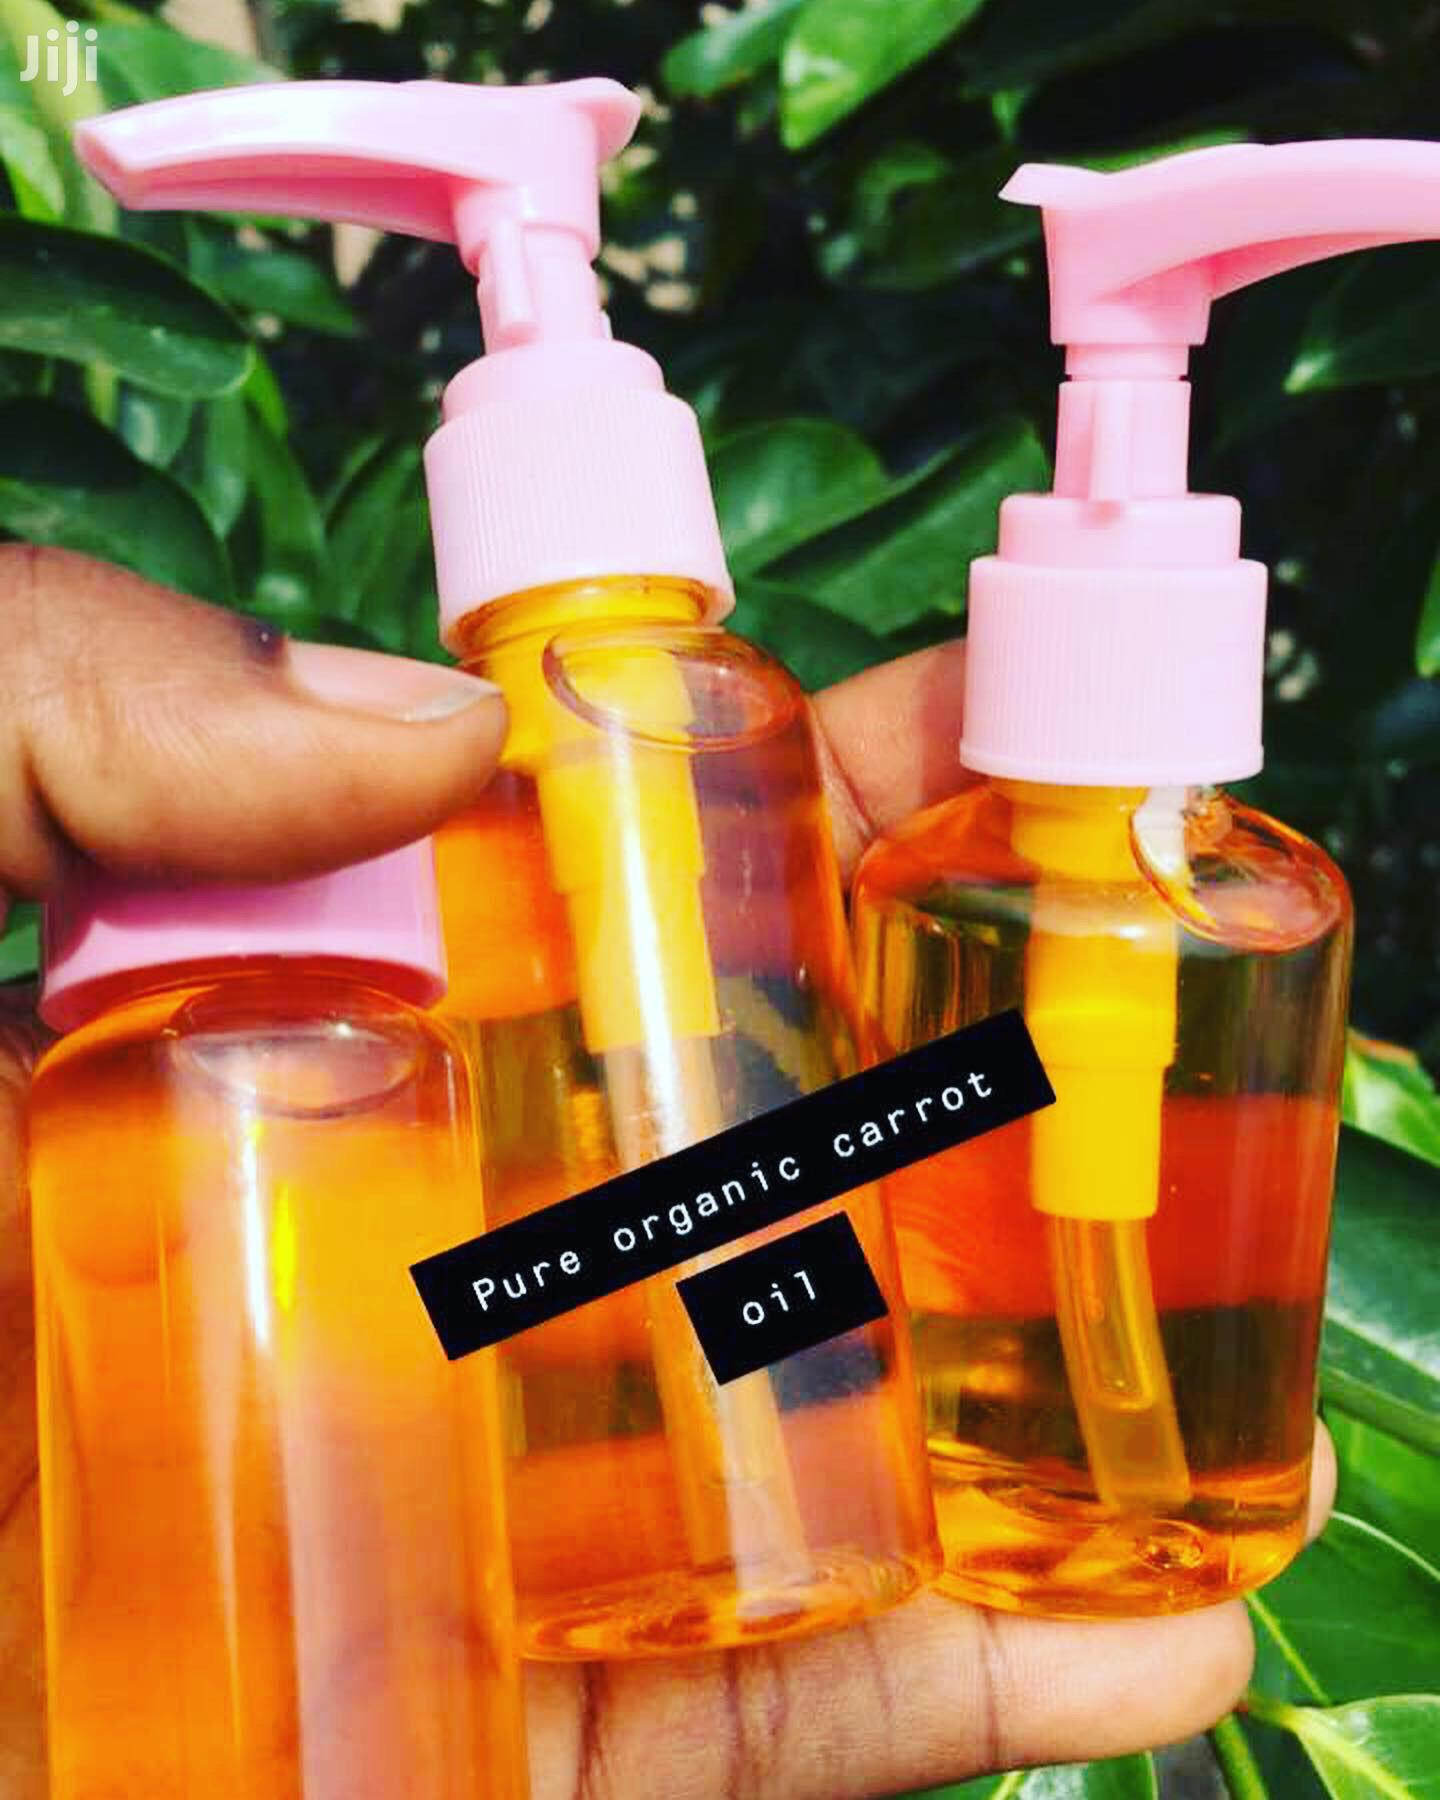 Pure Organic Carrot Oil | Skin Care for sale in Tema Metropolitan, Greater Accra, Ghana